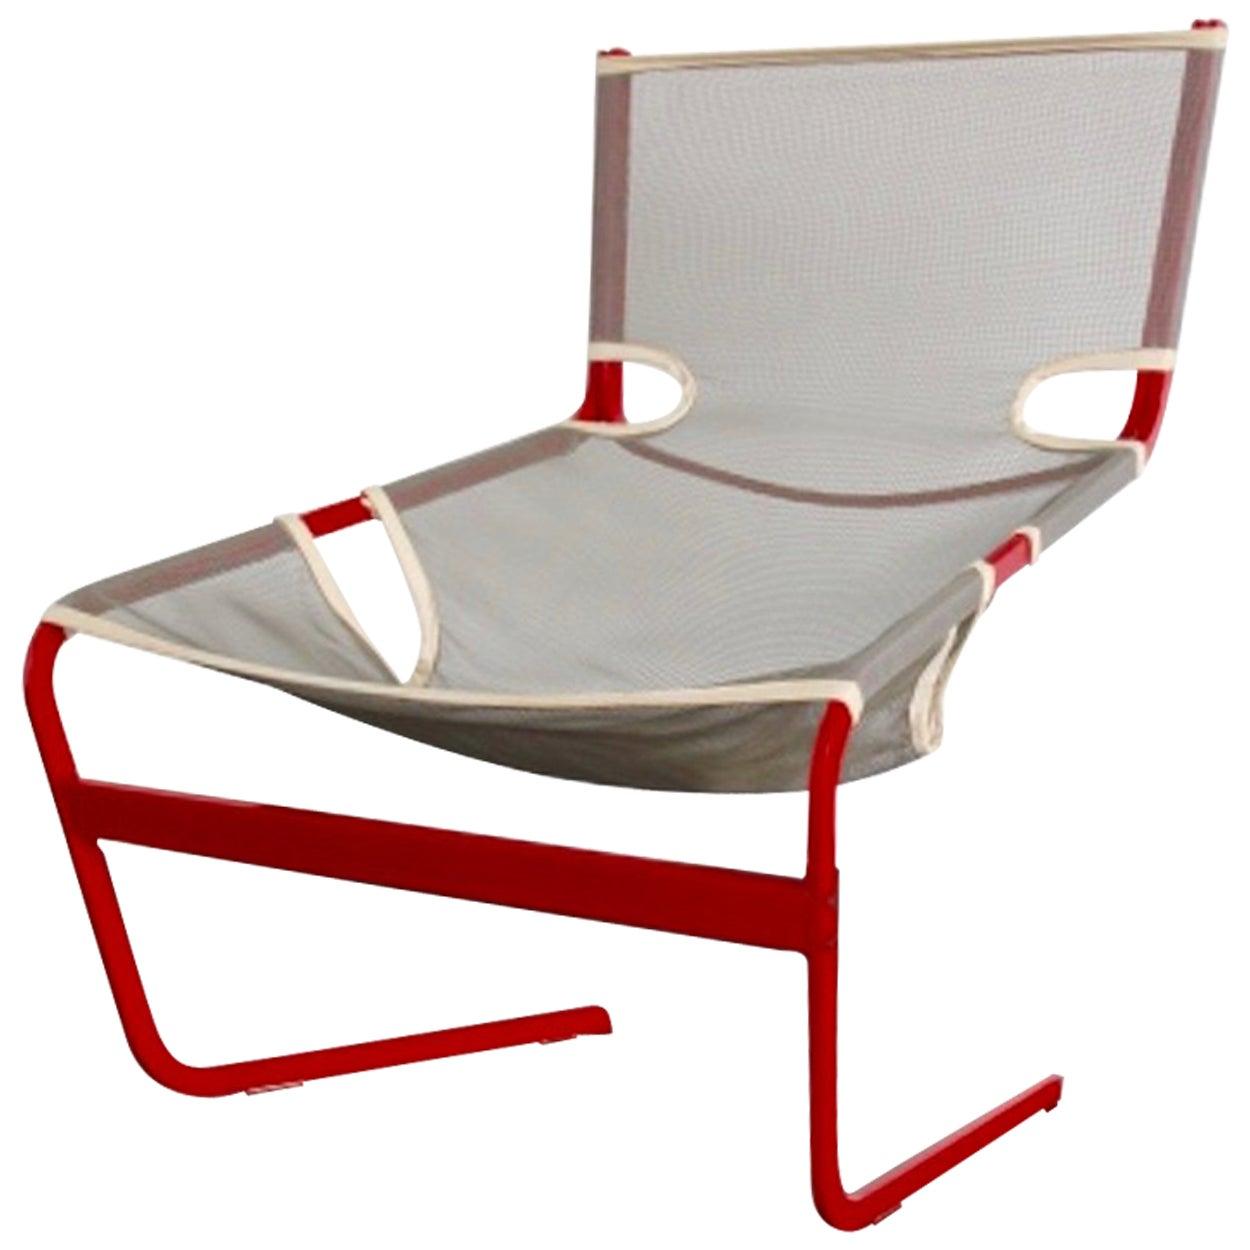 Rare Artifort F444 Chair by Pierre Paulin